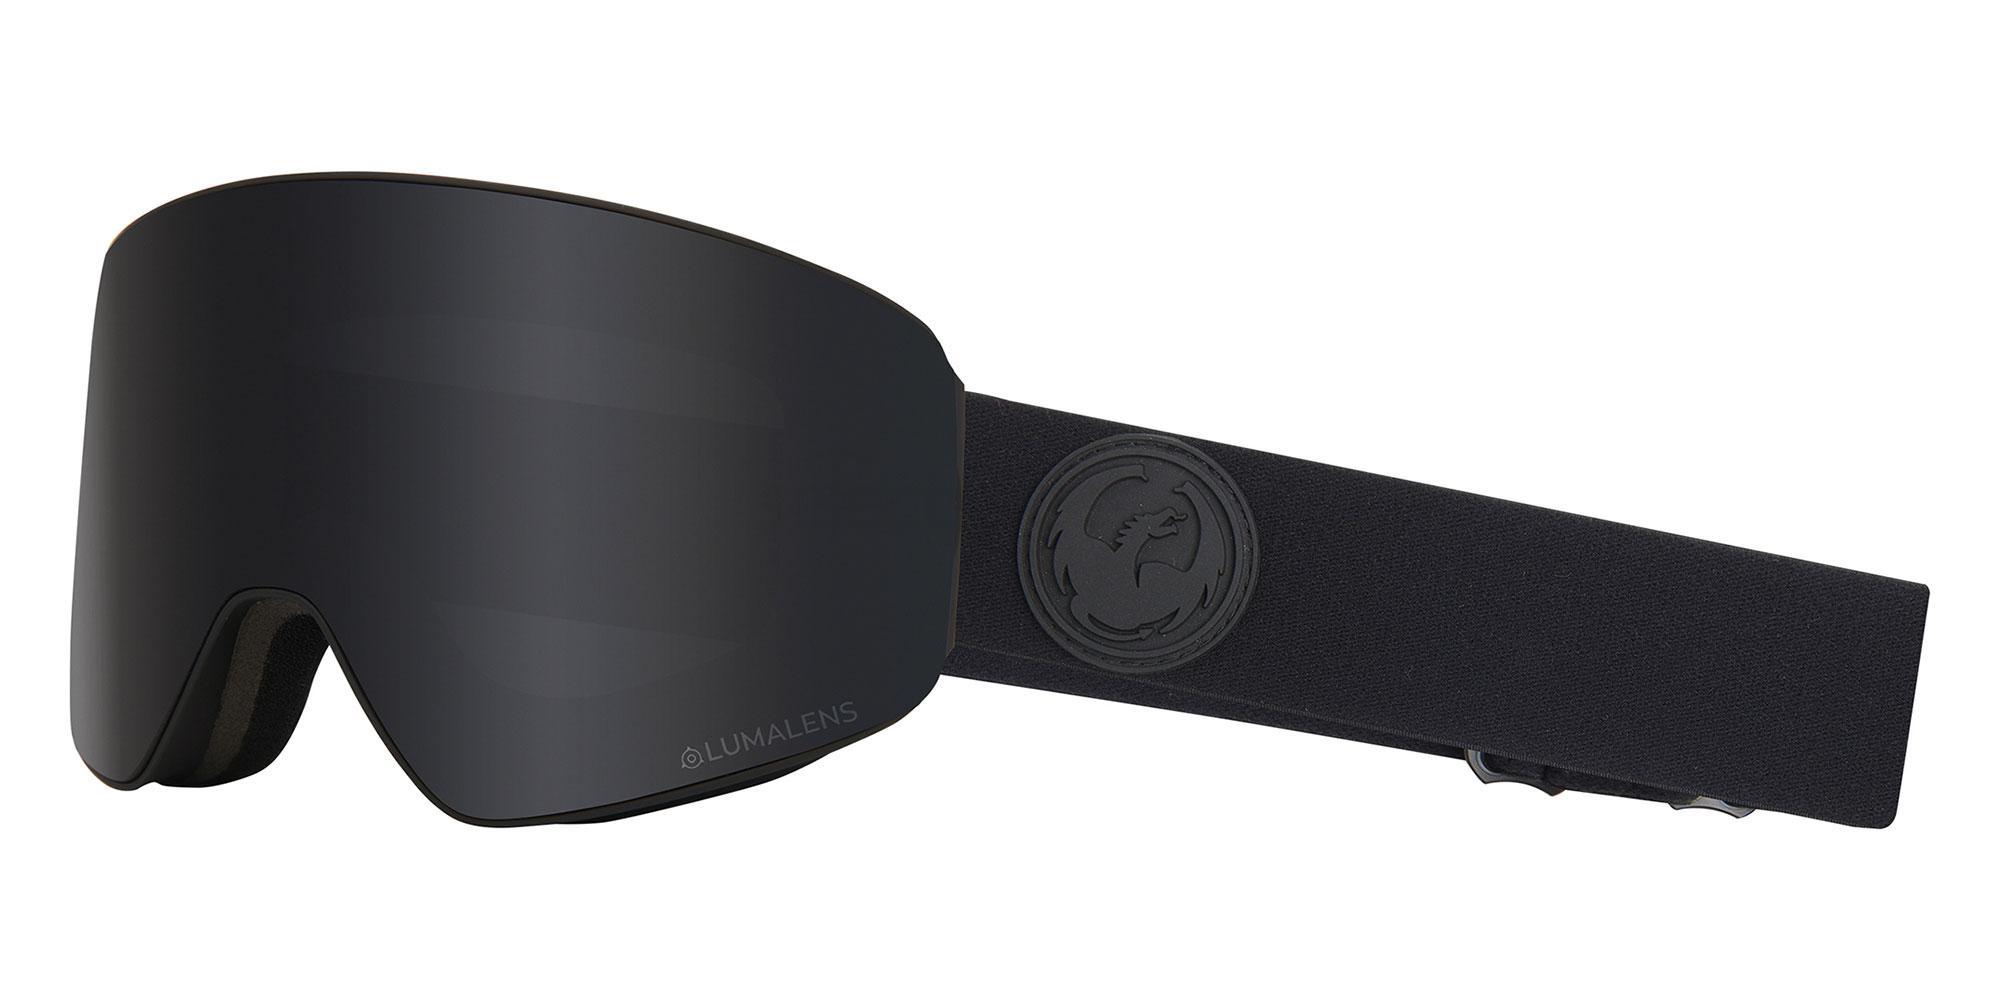 002 DR PXV BONUS PLUS Goggles, Dragon